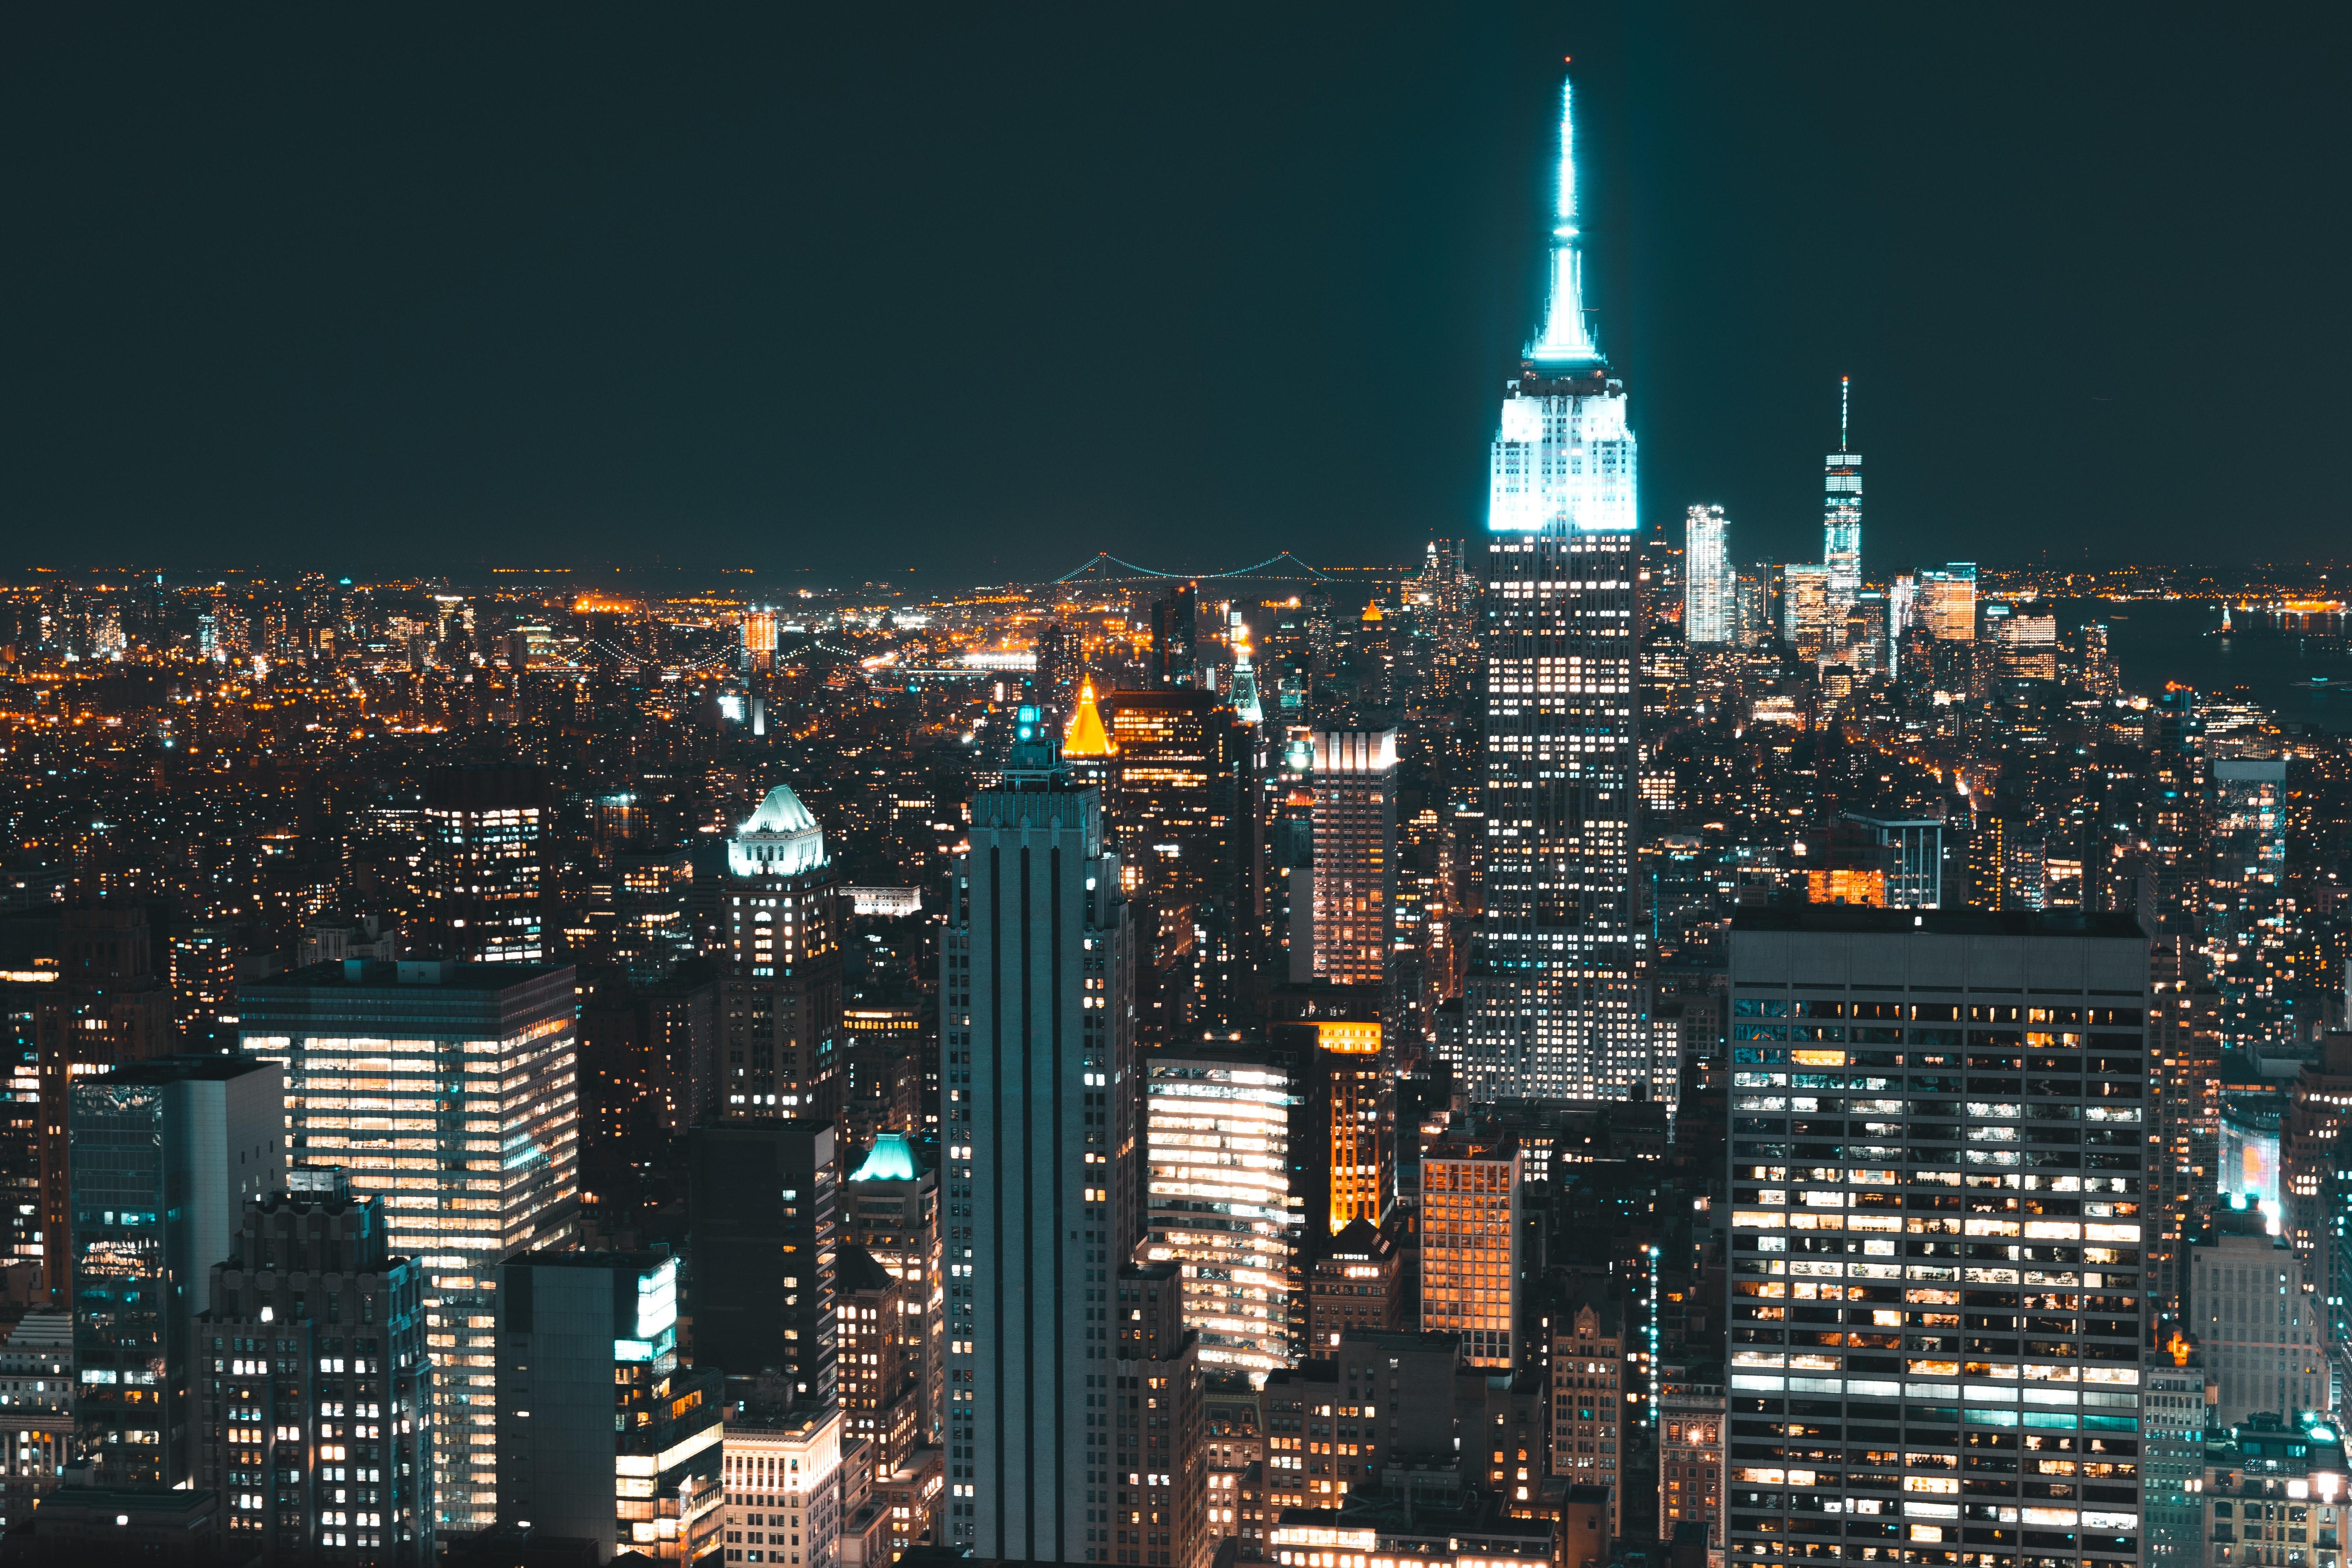 Most Inspiring Wallpaper Night Empire State Building - pexels-photo-597909  Pic-57814.jpg\u0026fm\u003djpg